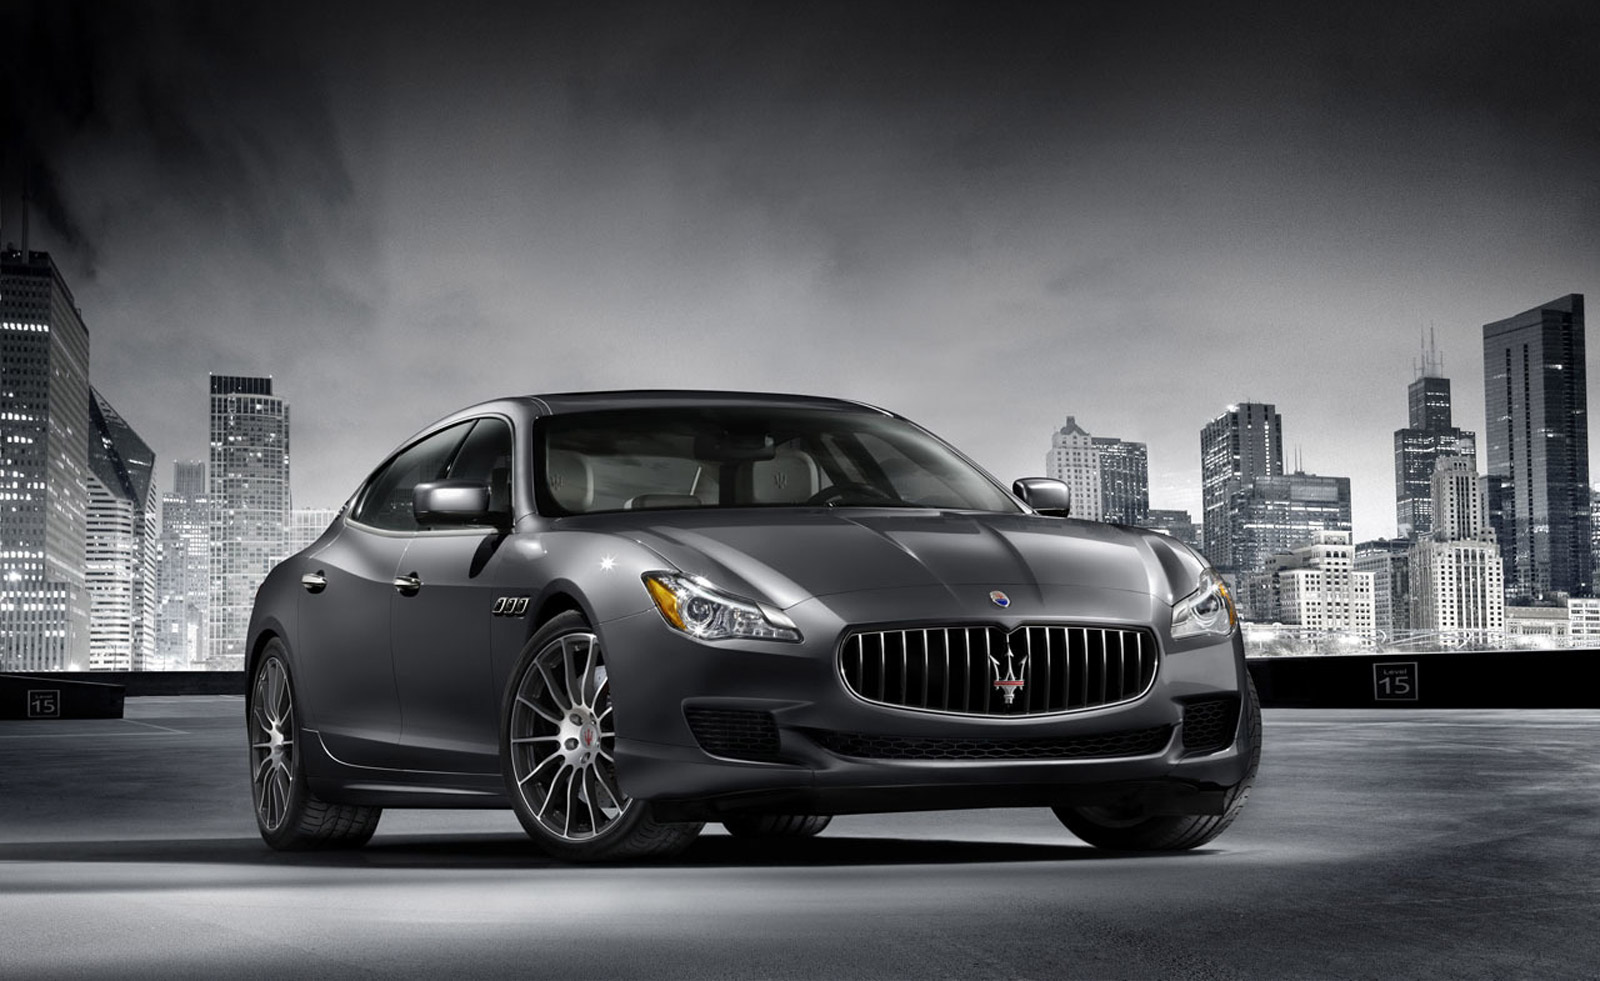 2015 Maserati Quattroporte And Ghibli Receive Updates